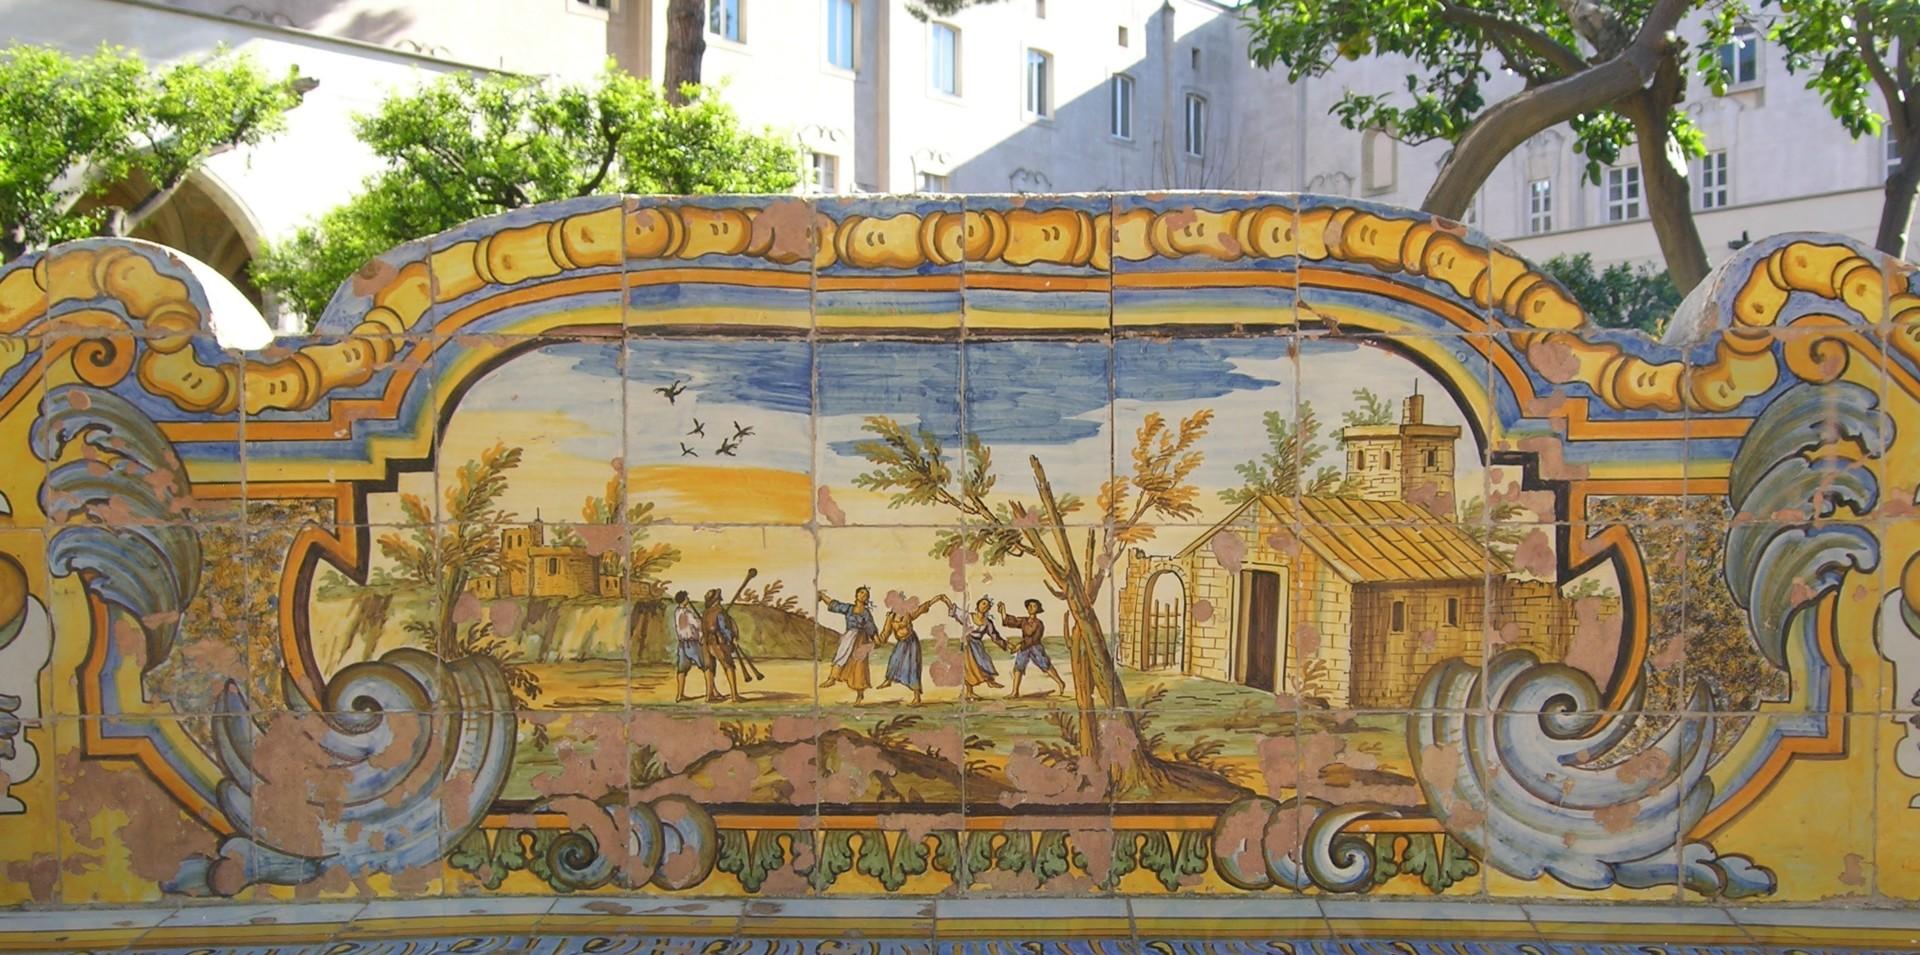 Sie tanzen die Tarantella, Majolika im Klosterhof von Santa Chiara